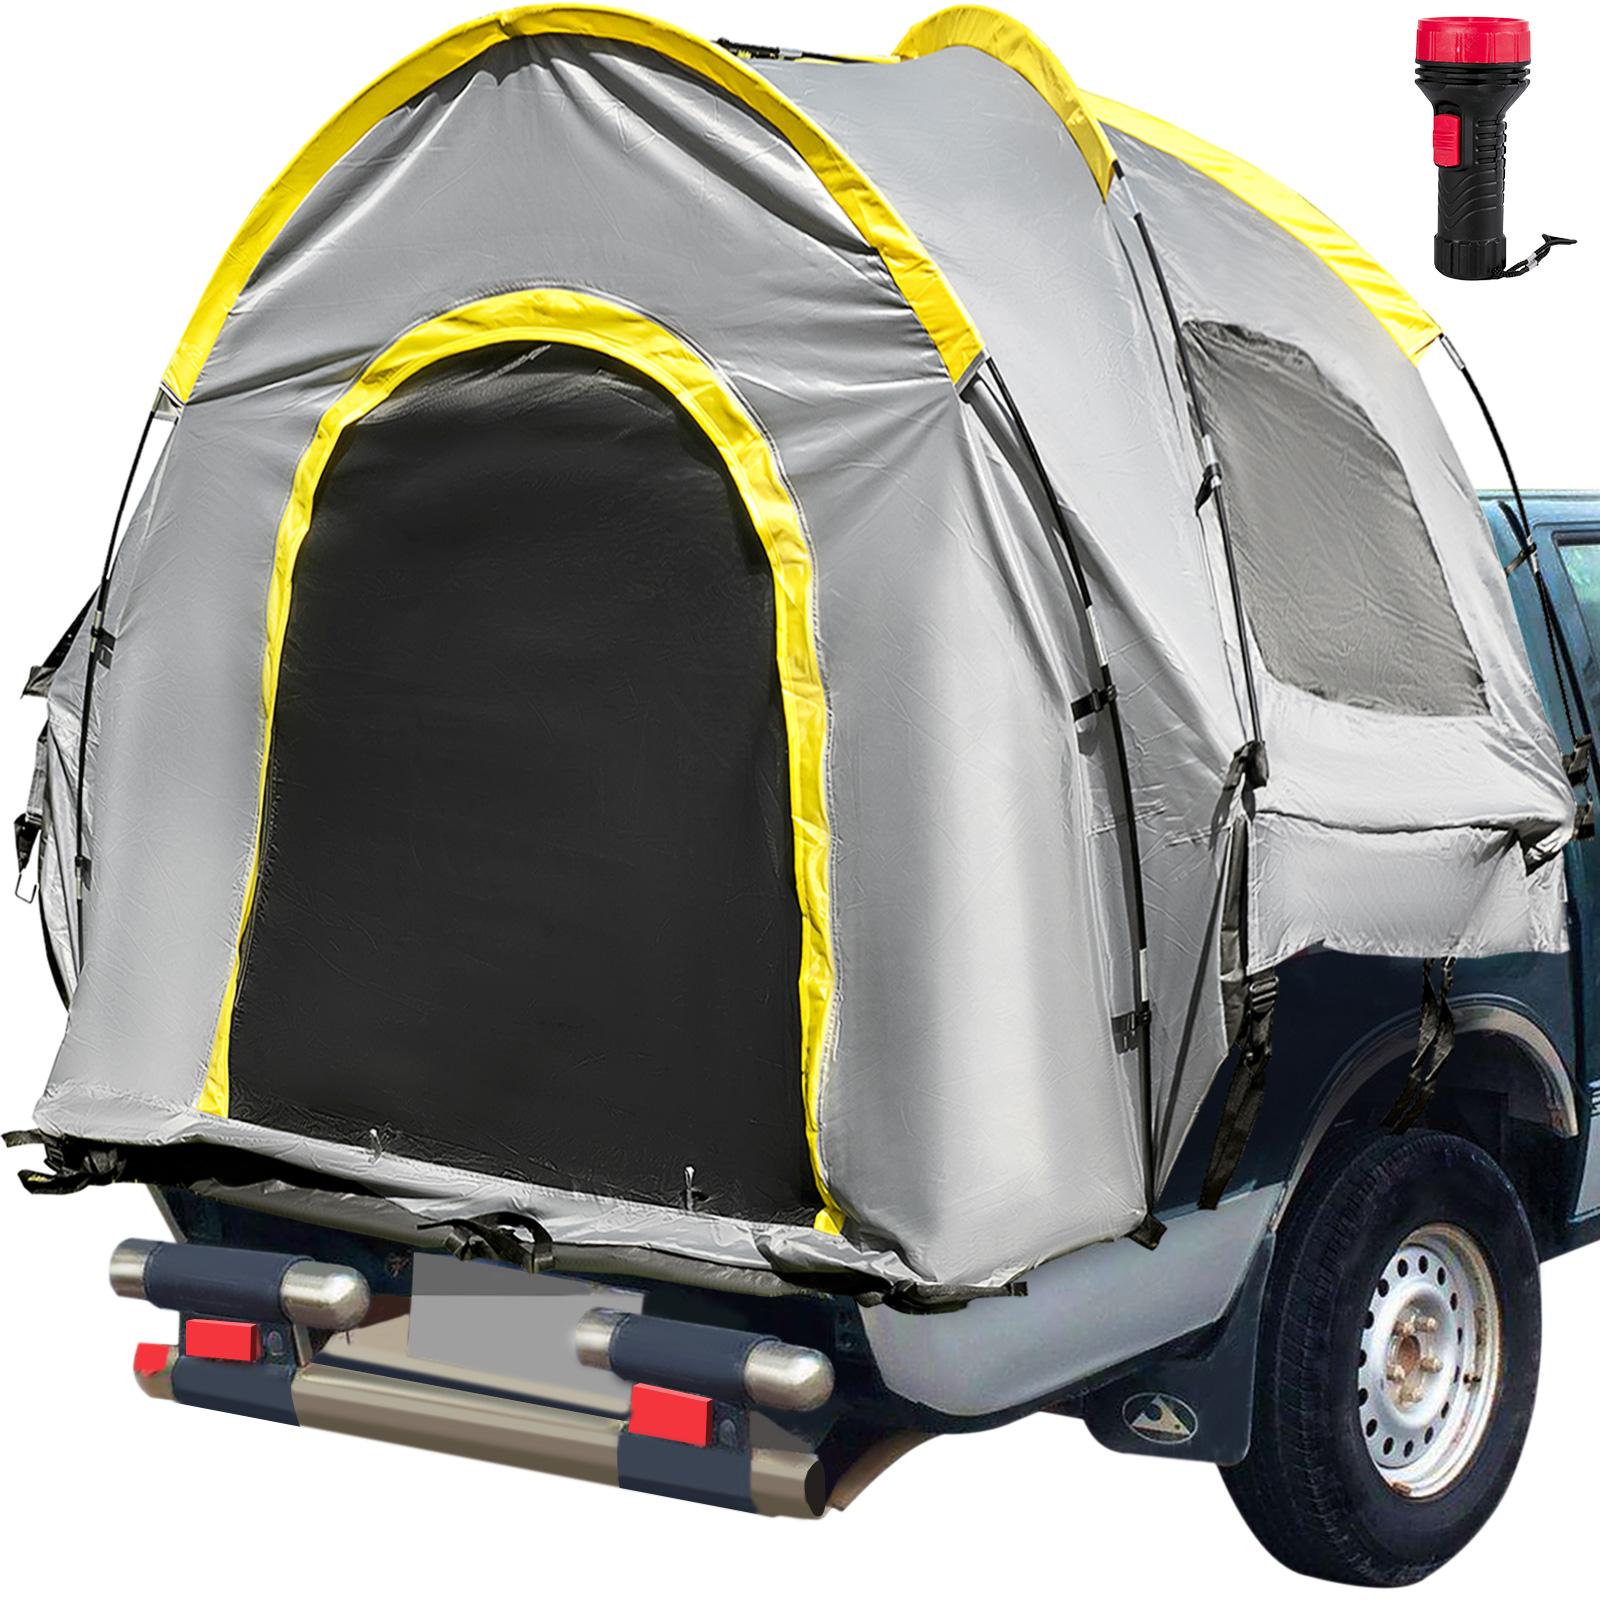 thumbnail 39 - VEVOR Truck Tent Truck Bed Tent 5' - 8' Pickup Tent Waterproof Outdoor Camping